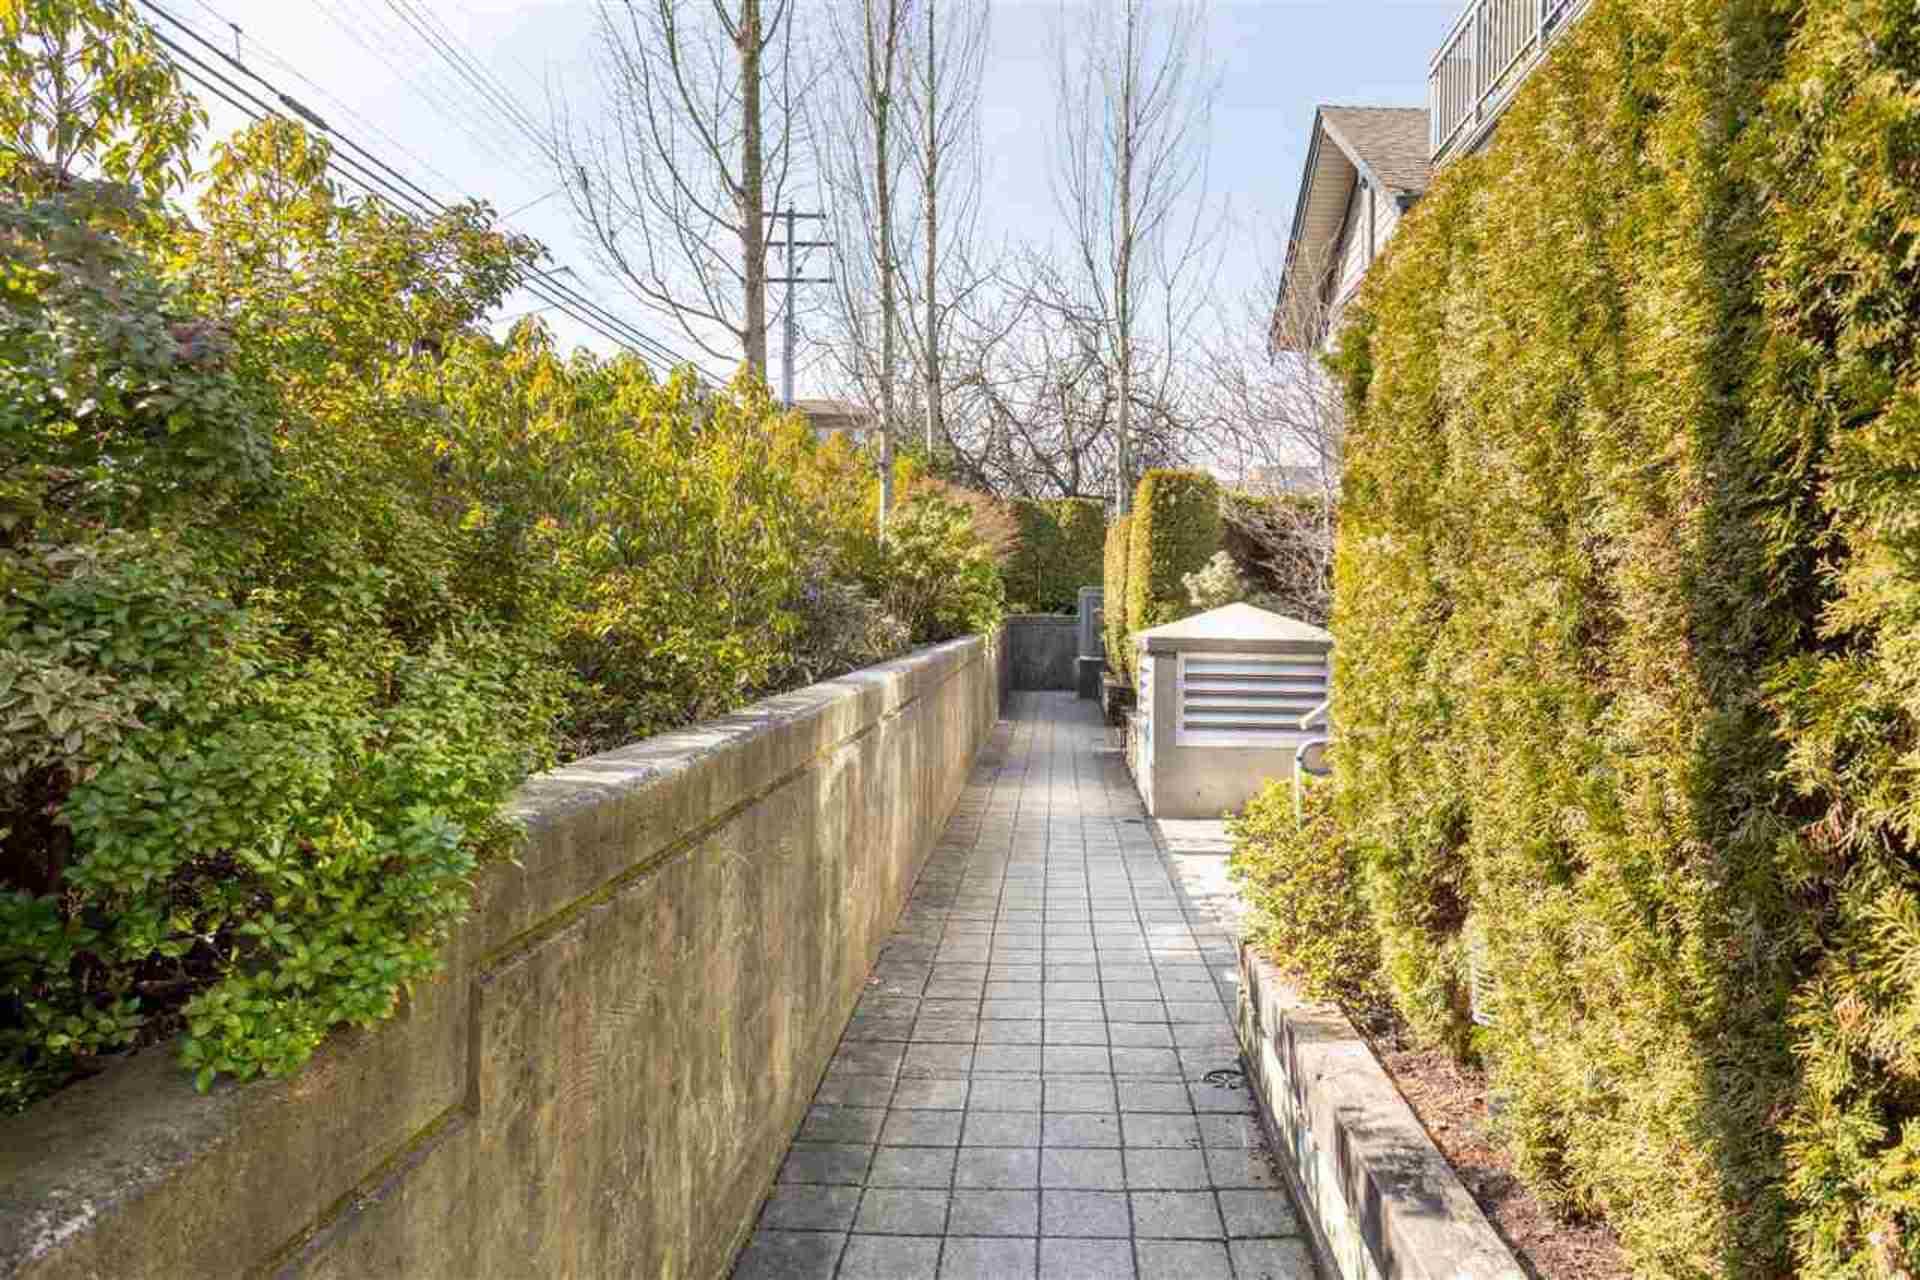 4438-albert-street-vancouver-heights-burnaby-north-14 at 110 - 4438 Albert Street, Vancouver Heights, Burnaby North